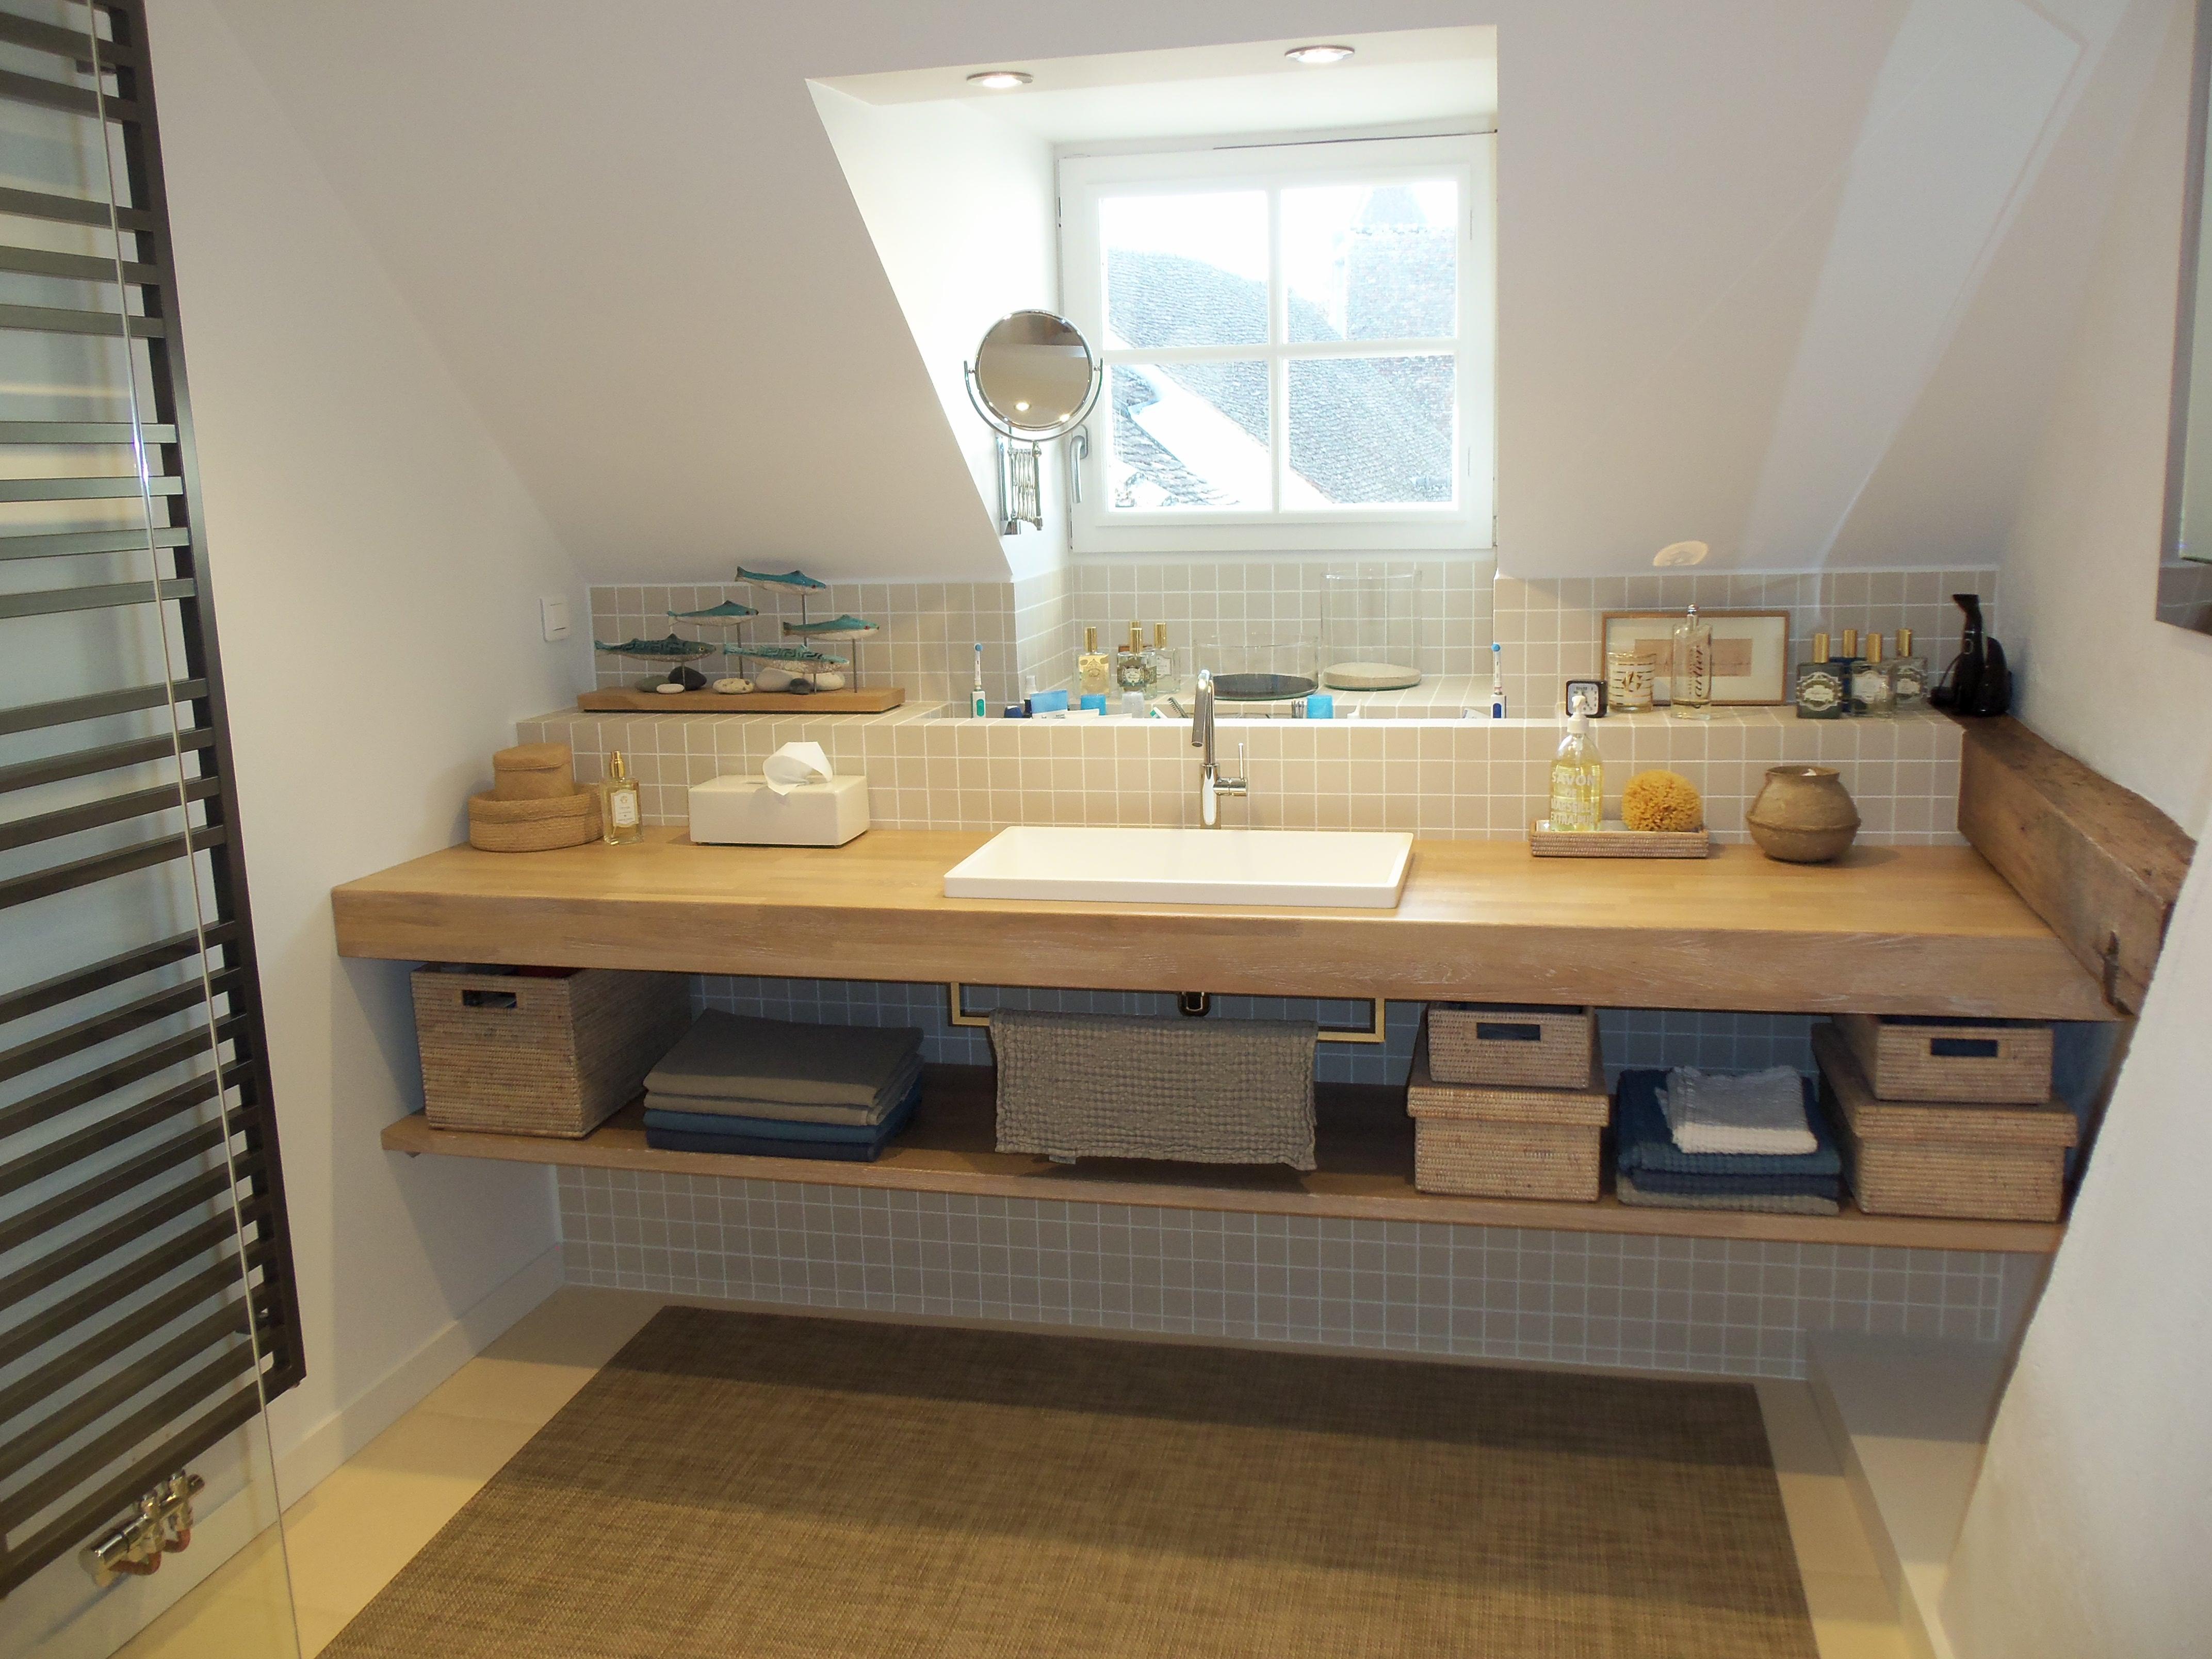 plan travail bois salle de bain flip design boisflip design bois. Black Bedroom Furniture Sets. Home Design Ideas